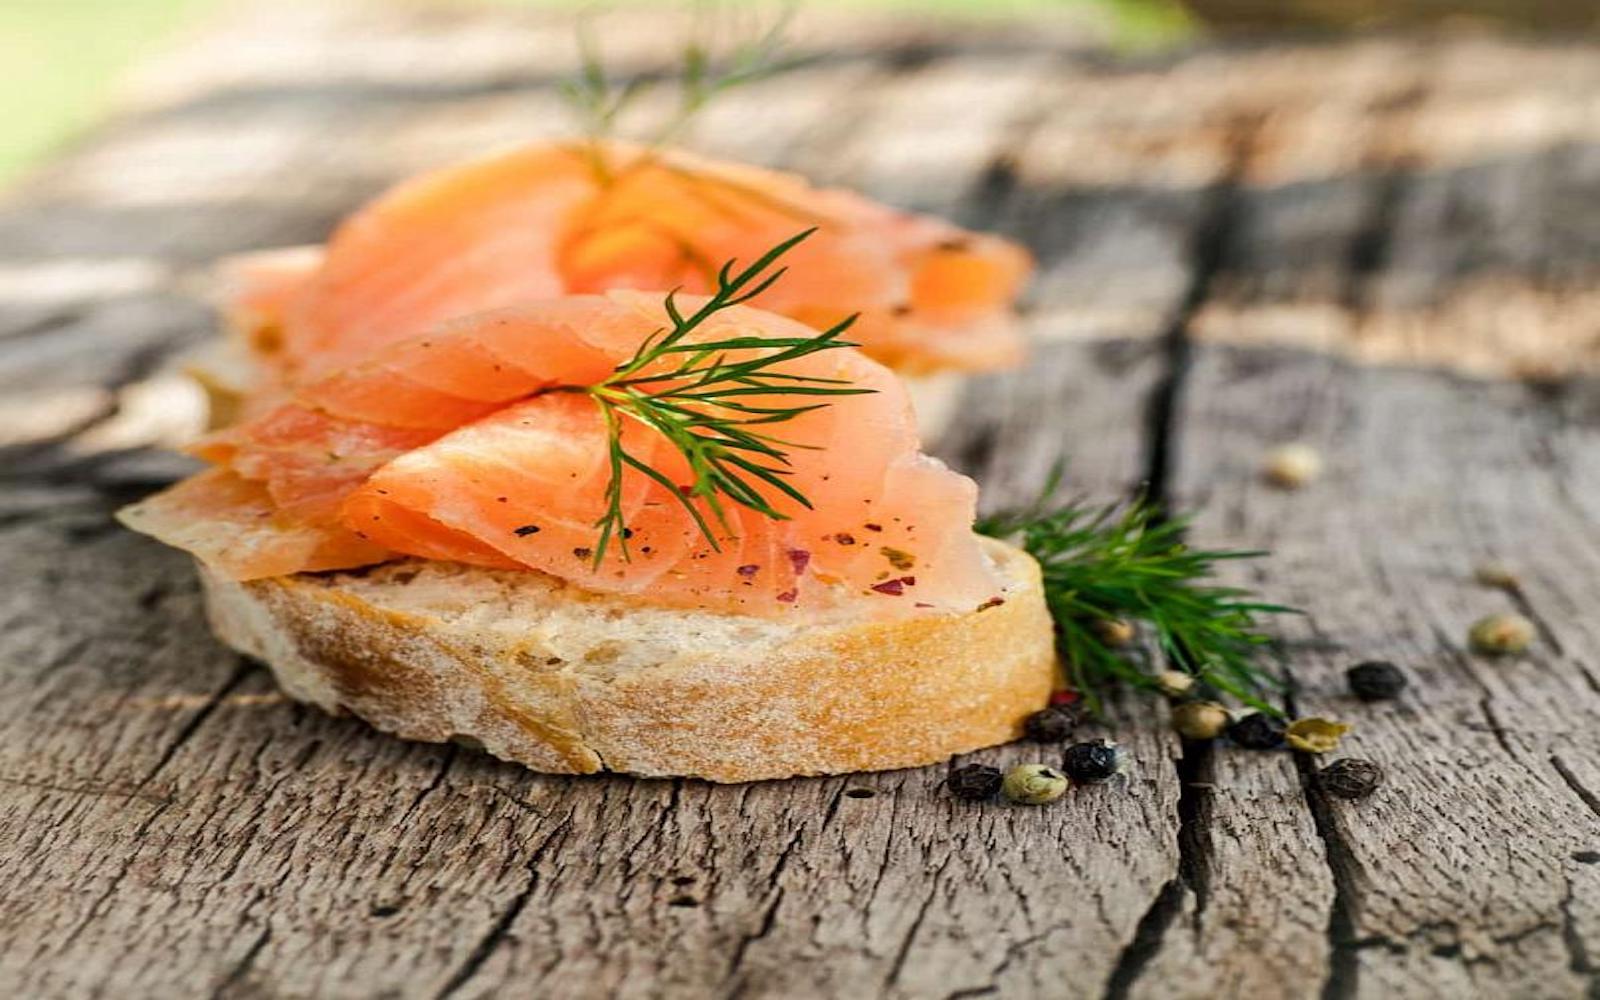 http://www.livingit.euronews.com/2018/04/06/bordeaux-startup-launches-vegan-smoked-salmon